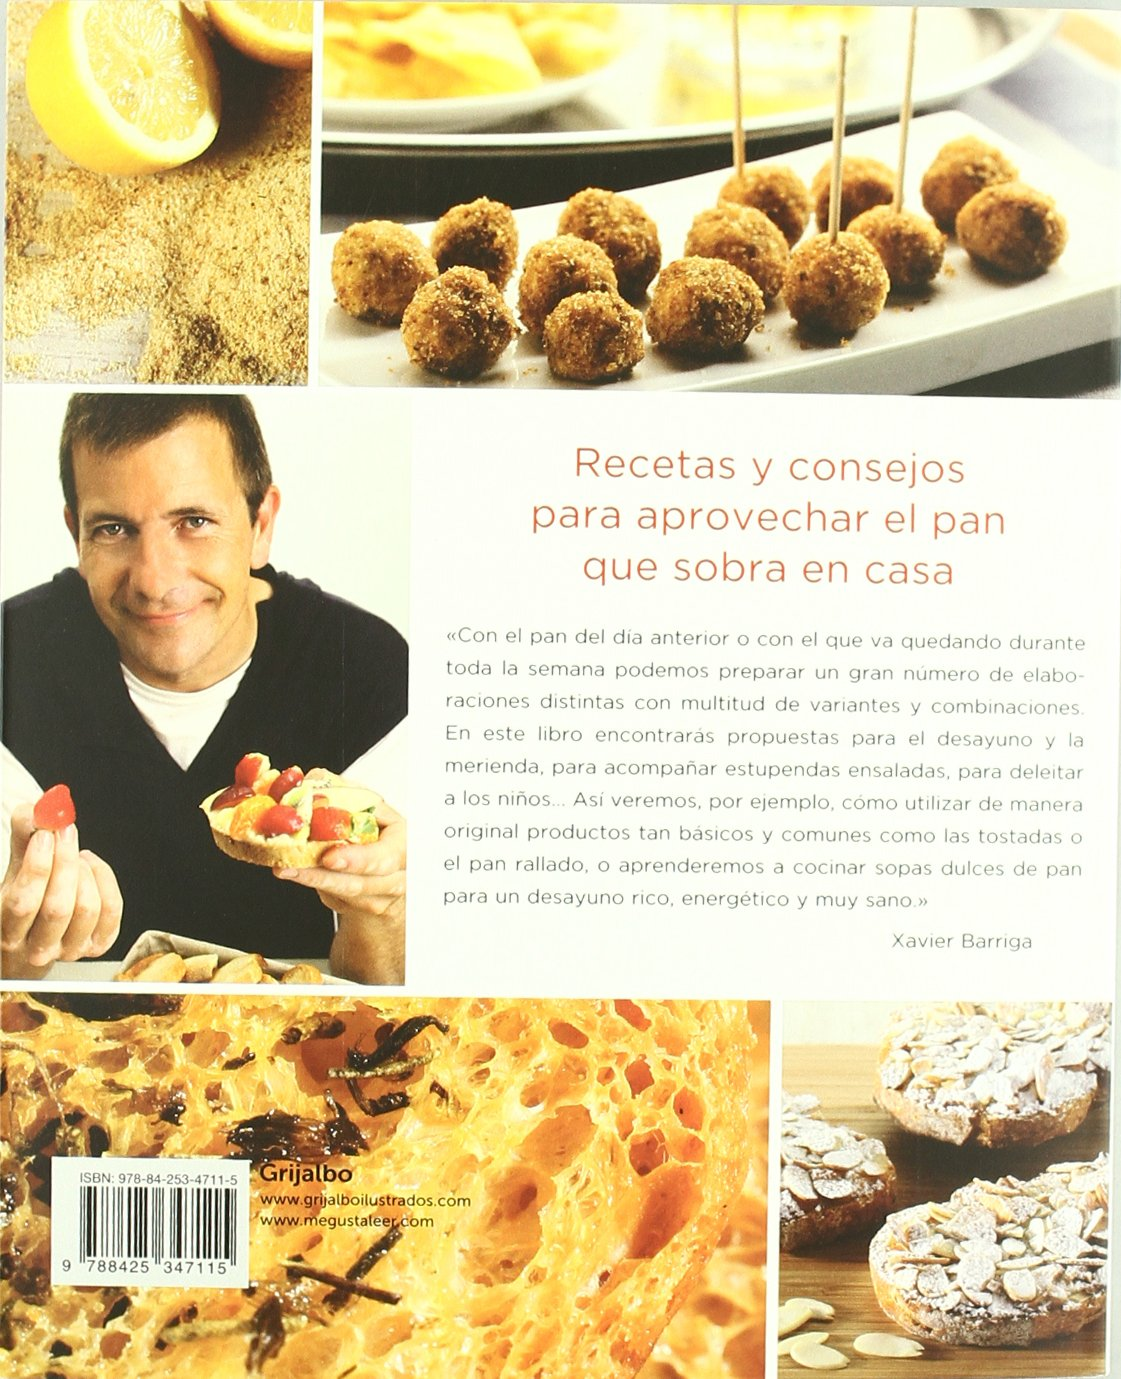 Recetas Caseras Con Pan De Ayer (Sabores): Amazon.es: Xavier Barriga: Libros